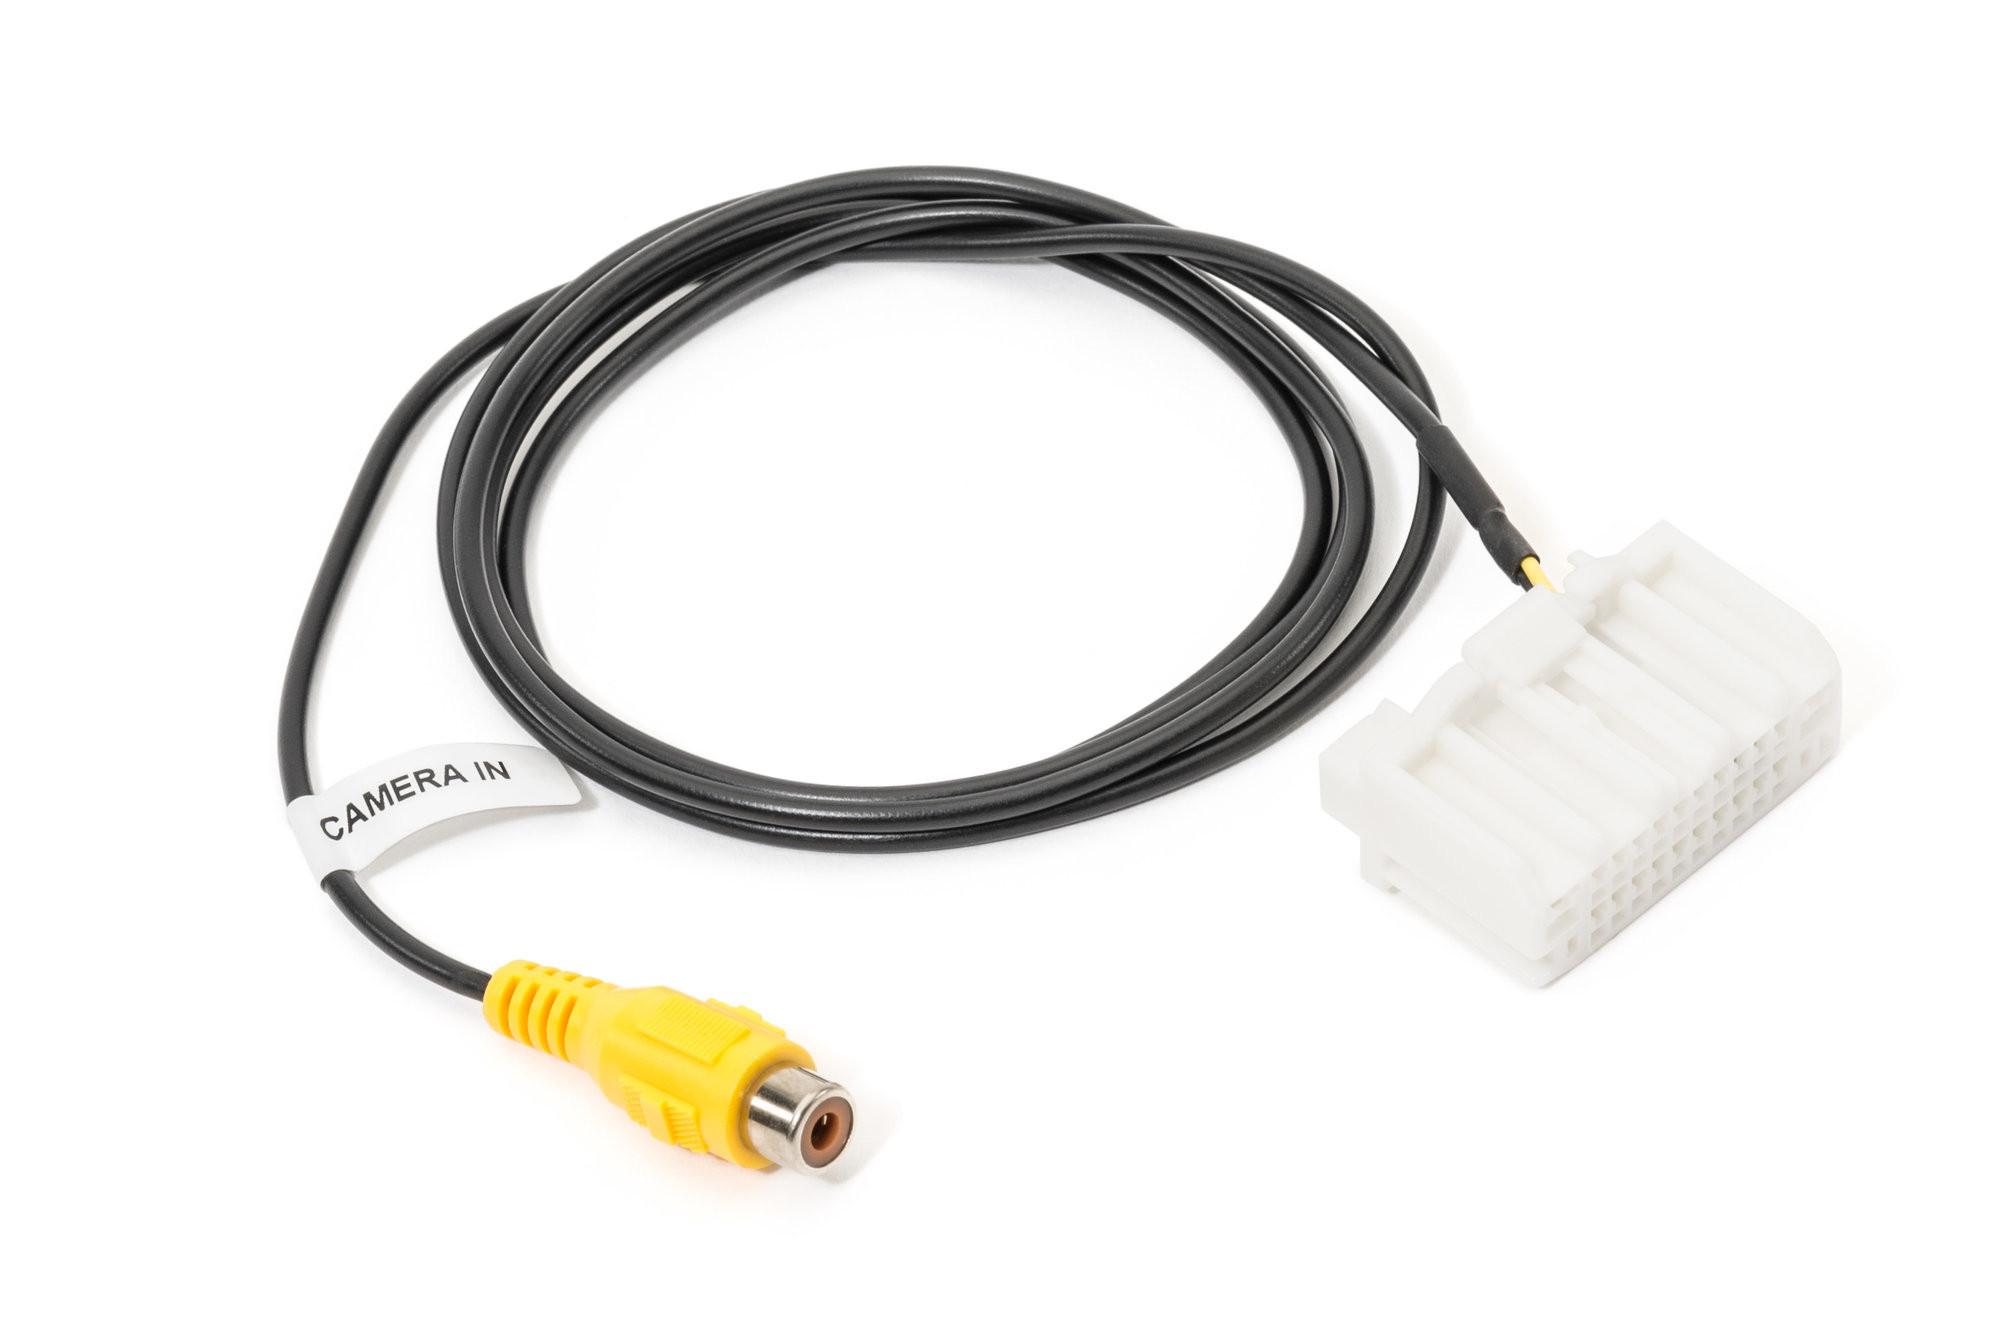 Kensun Wiring Harness | Wiring Liry on